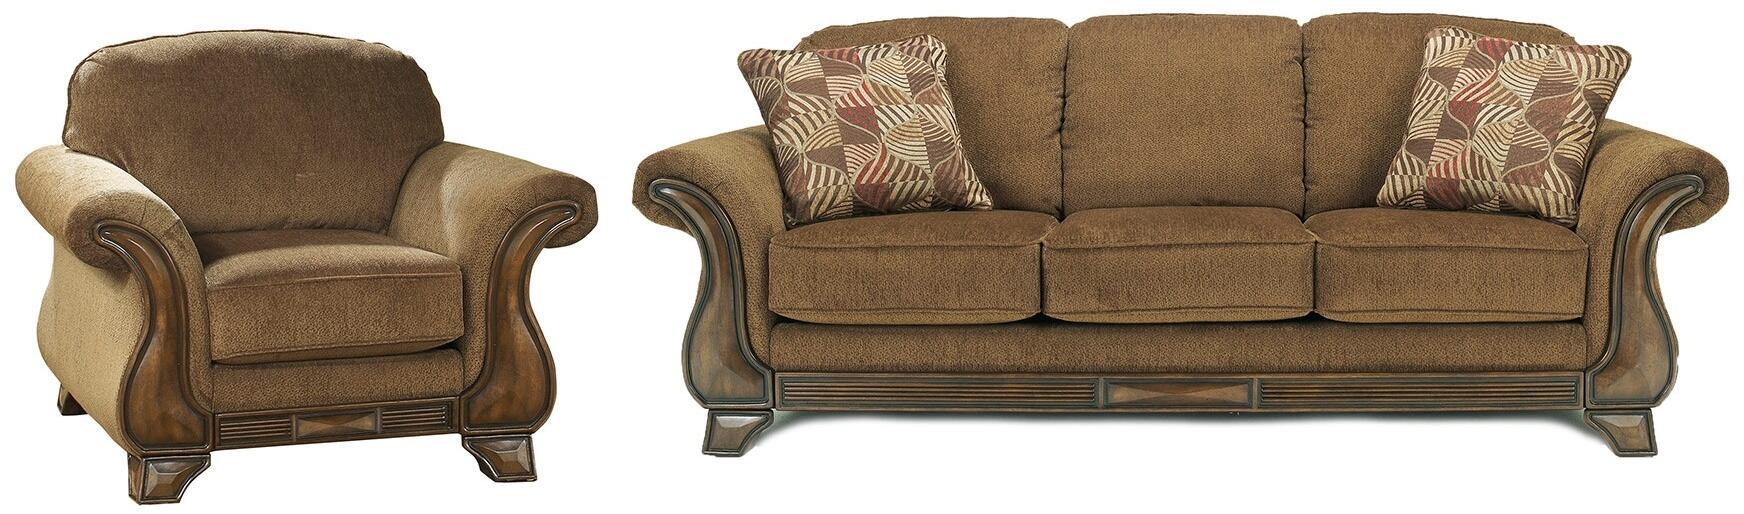 8ff472a2ec4d24 Signature Design by Ashley 38300SC Montgomery Living Room Se ...